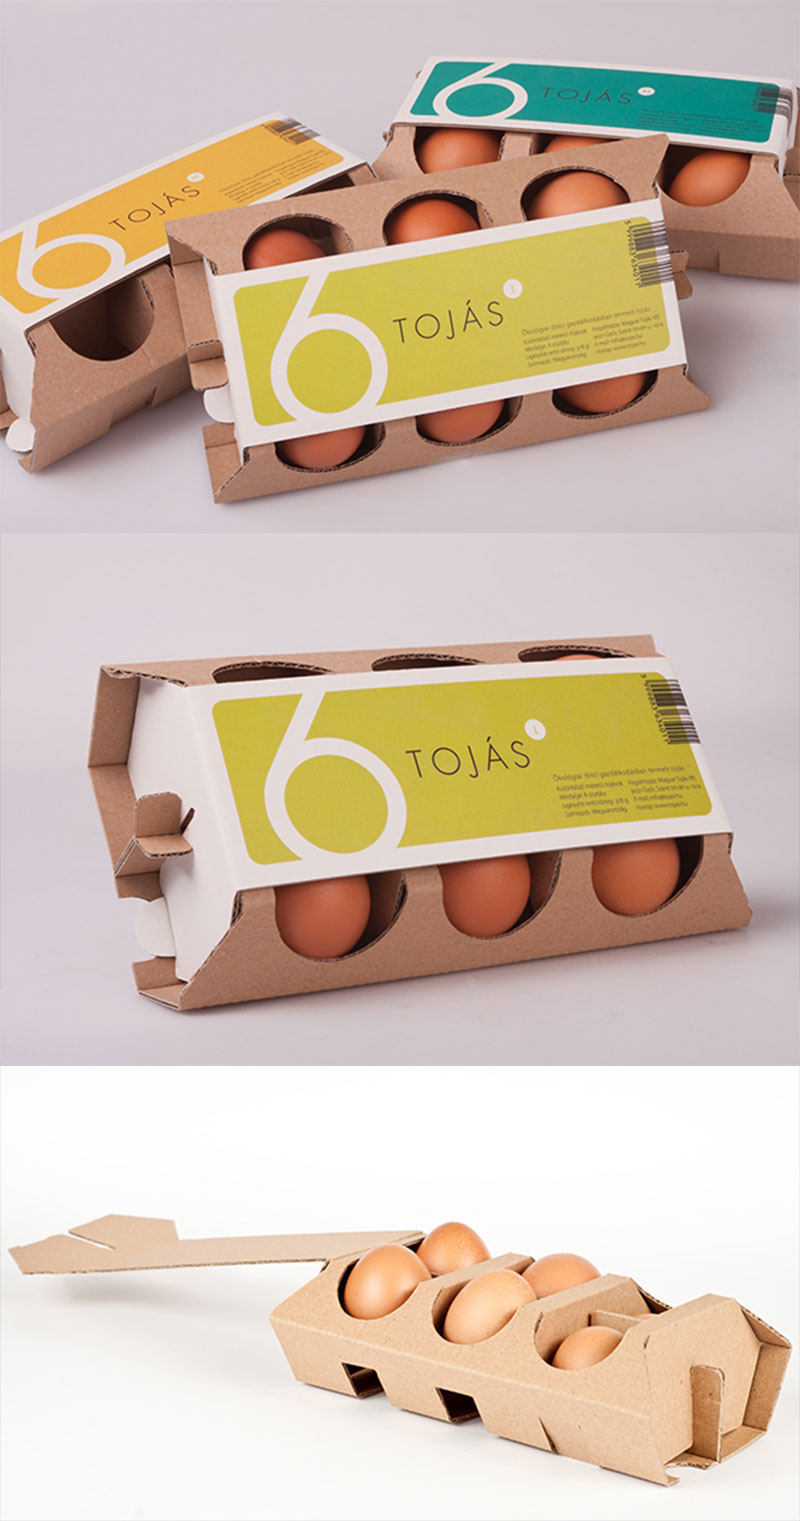 Egg Box 2 / Ei-Kasten 2 / Tojástartó 2 by Anita Vaskó